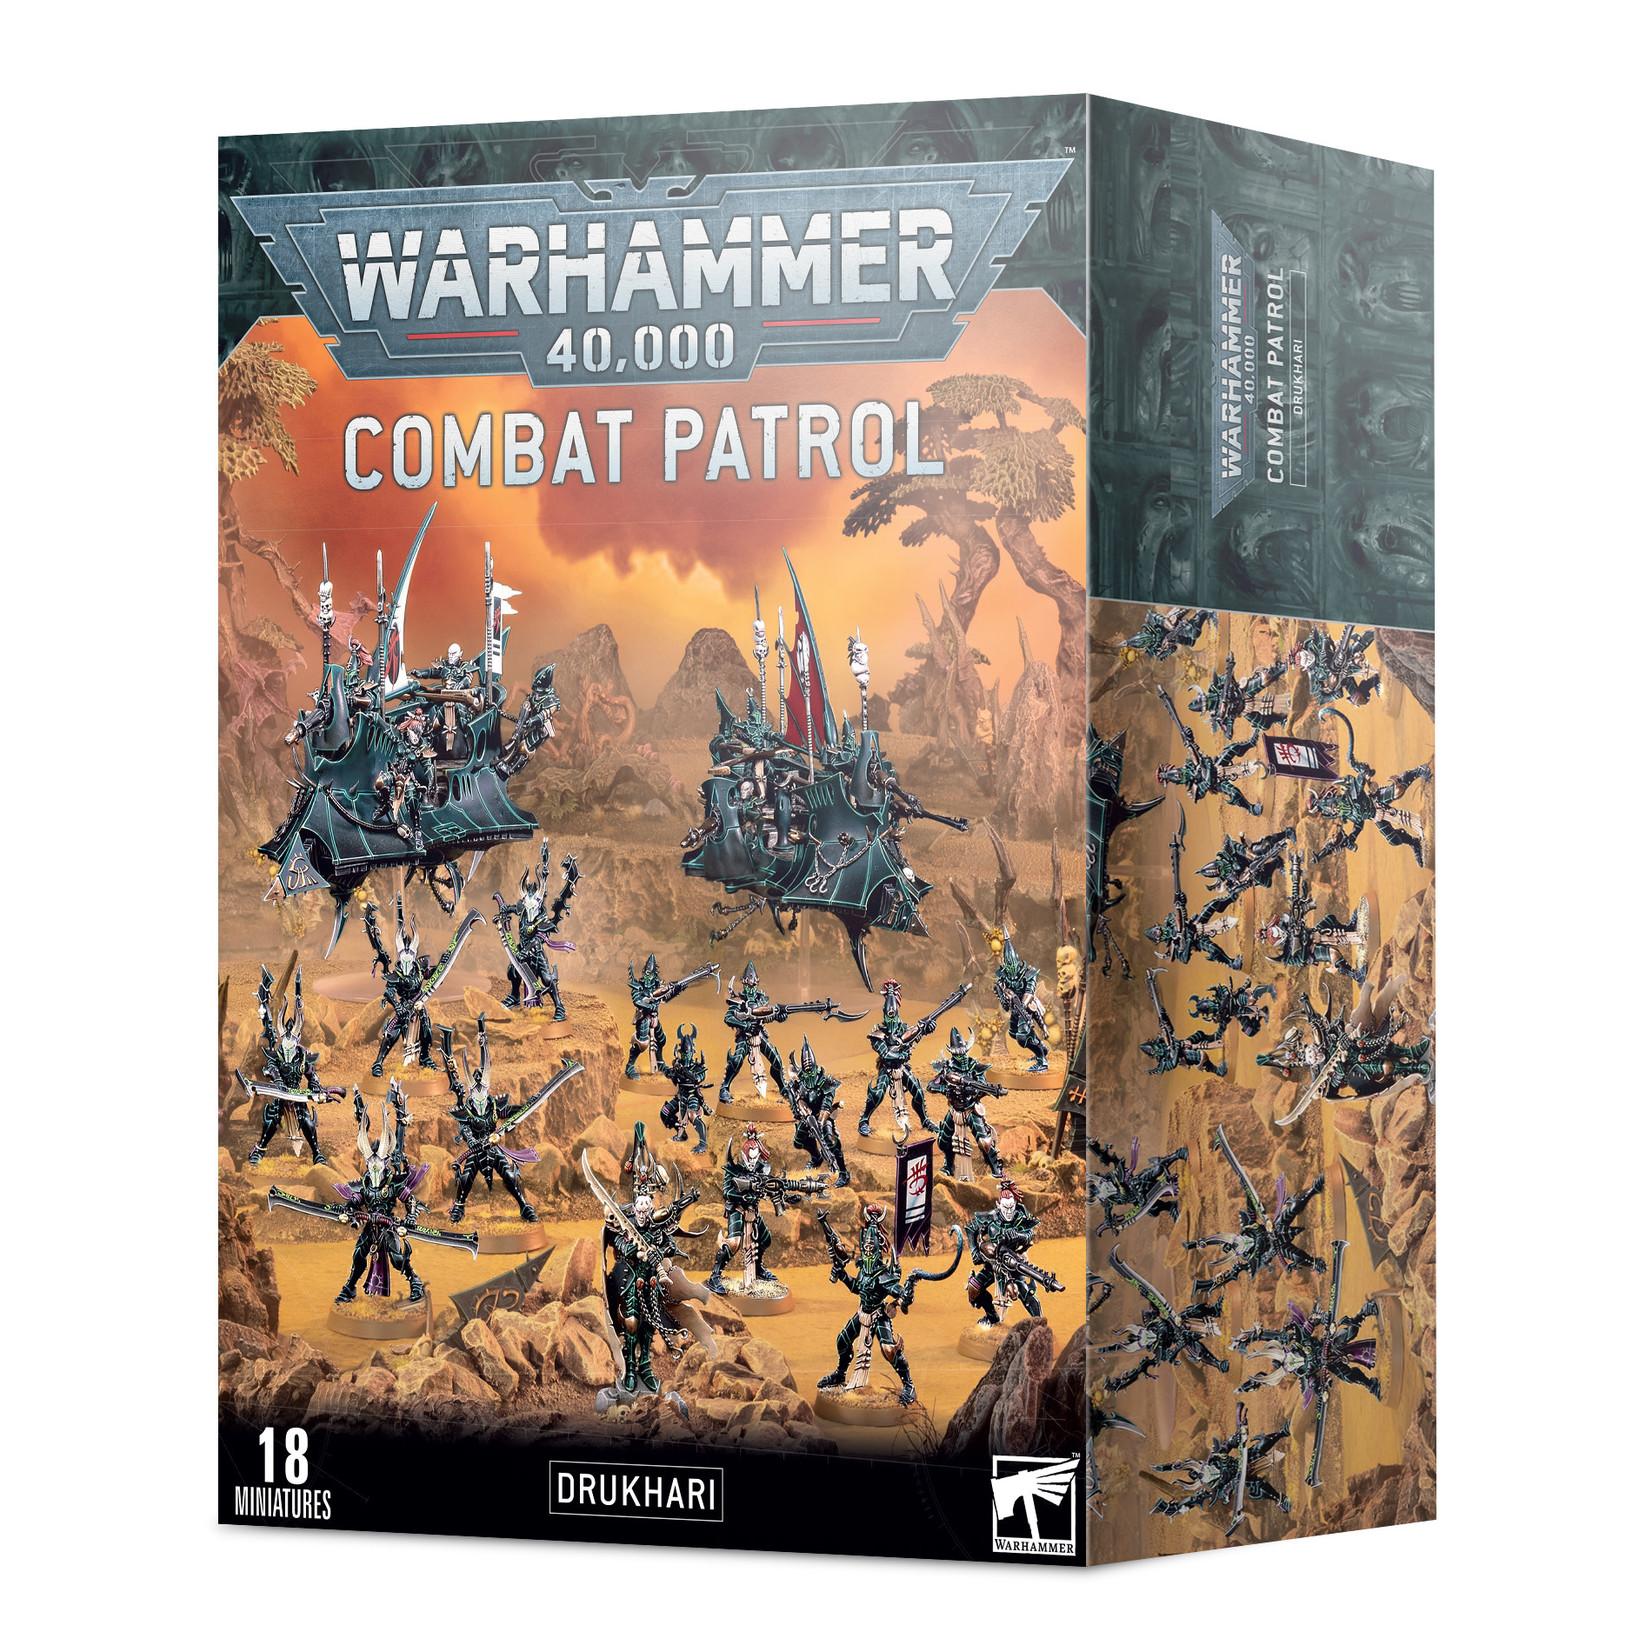 Warhammer 40K Combat Patrol Drukhari